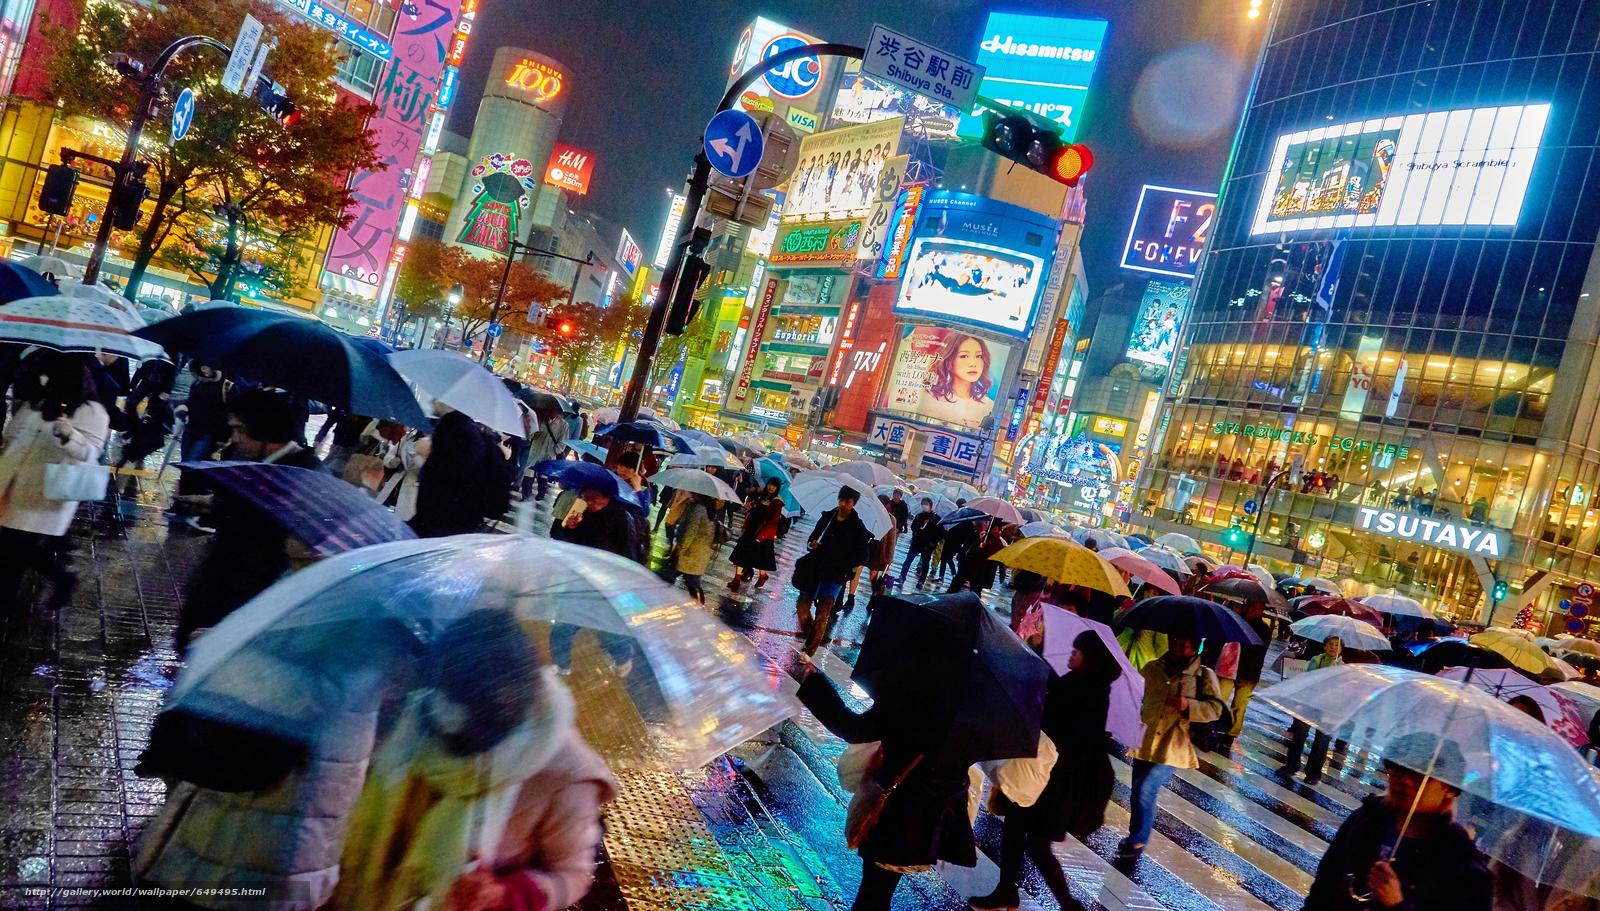 Download wallpaper city,  megalopolis,  Japan,  Tokyo free desktop wallpaper in the resolution 3840x2186 — picture №649495